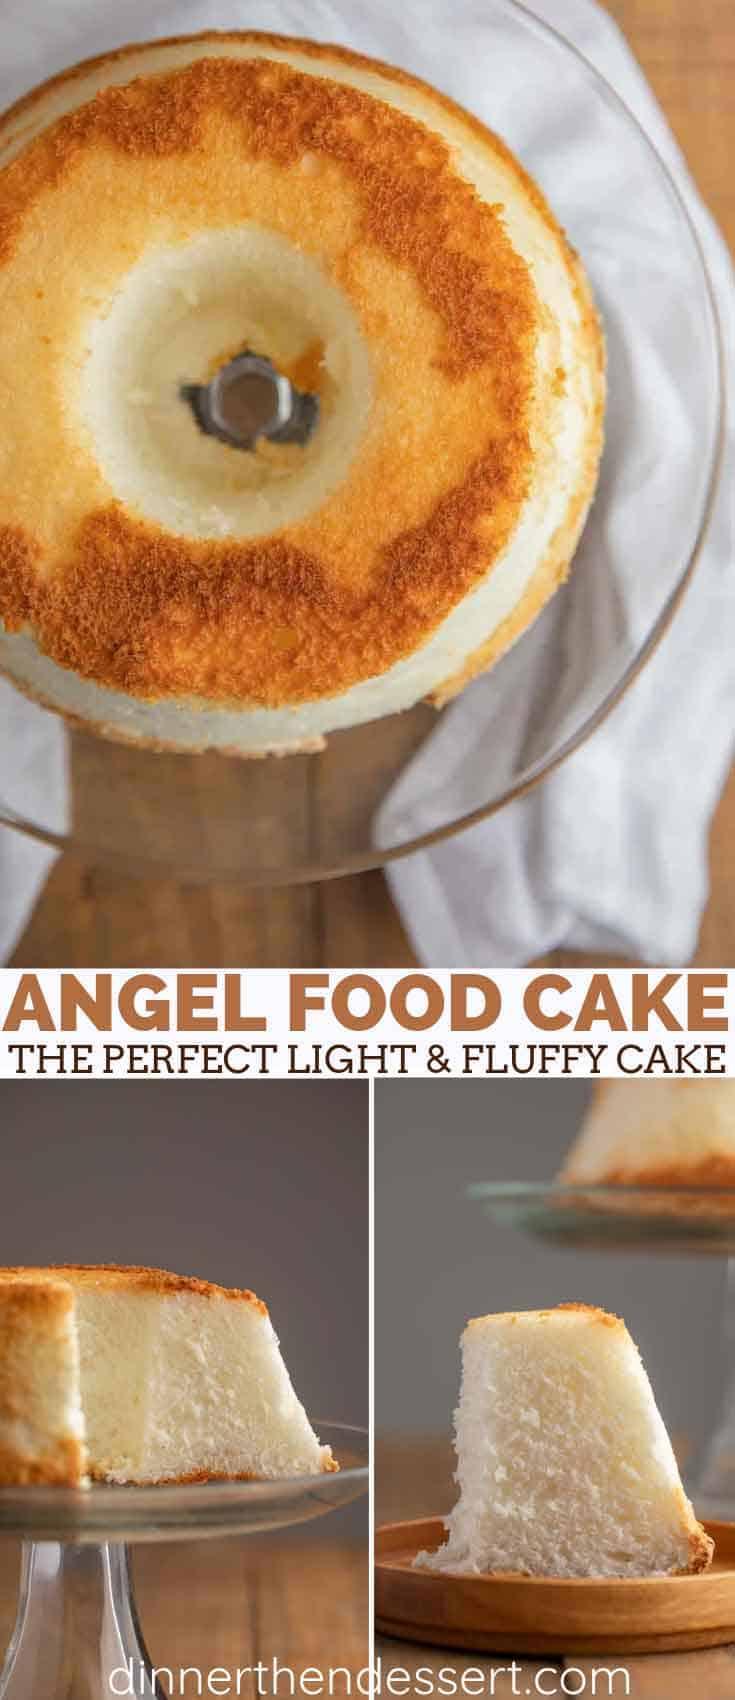 Perfectly Light Angel Food Cake Fail Proof Dinner Then Dessert